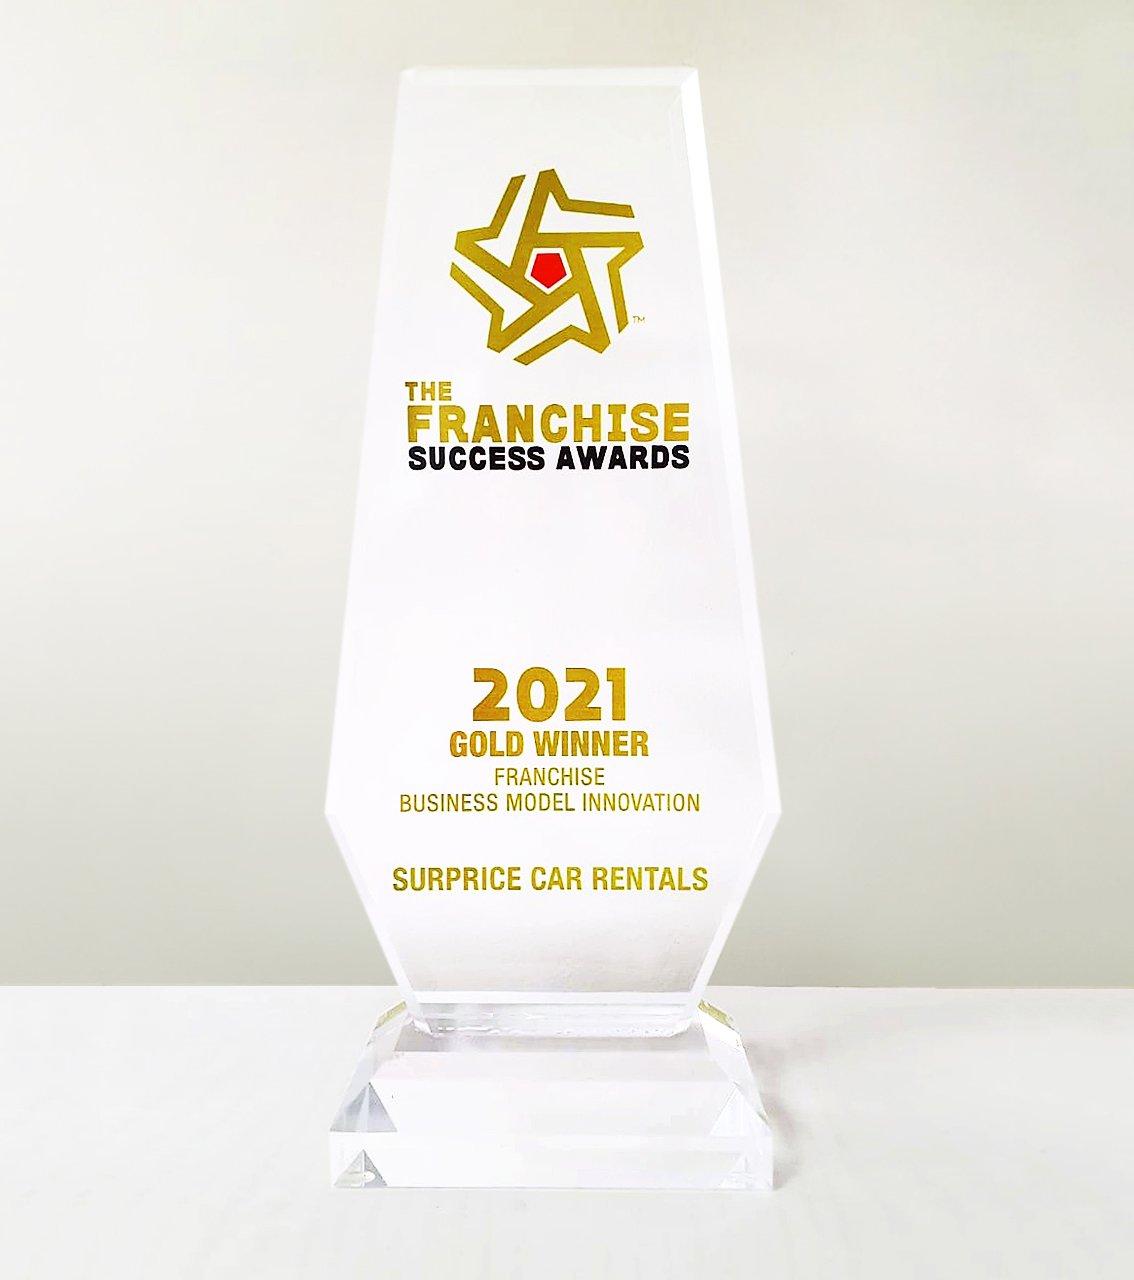 surprice-car-rentals-franchise-awards